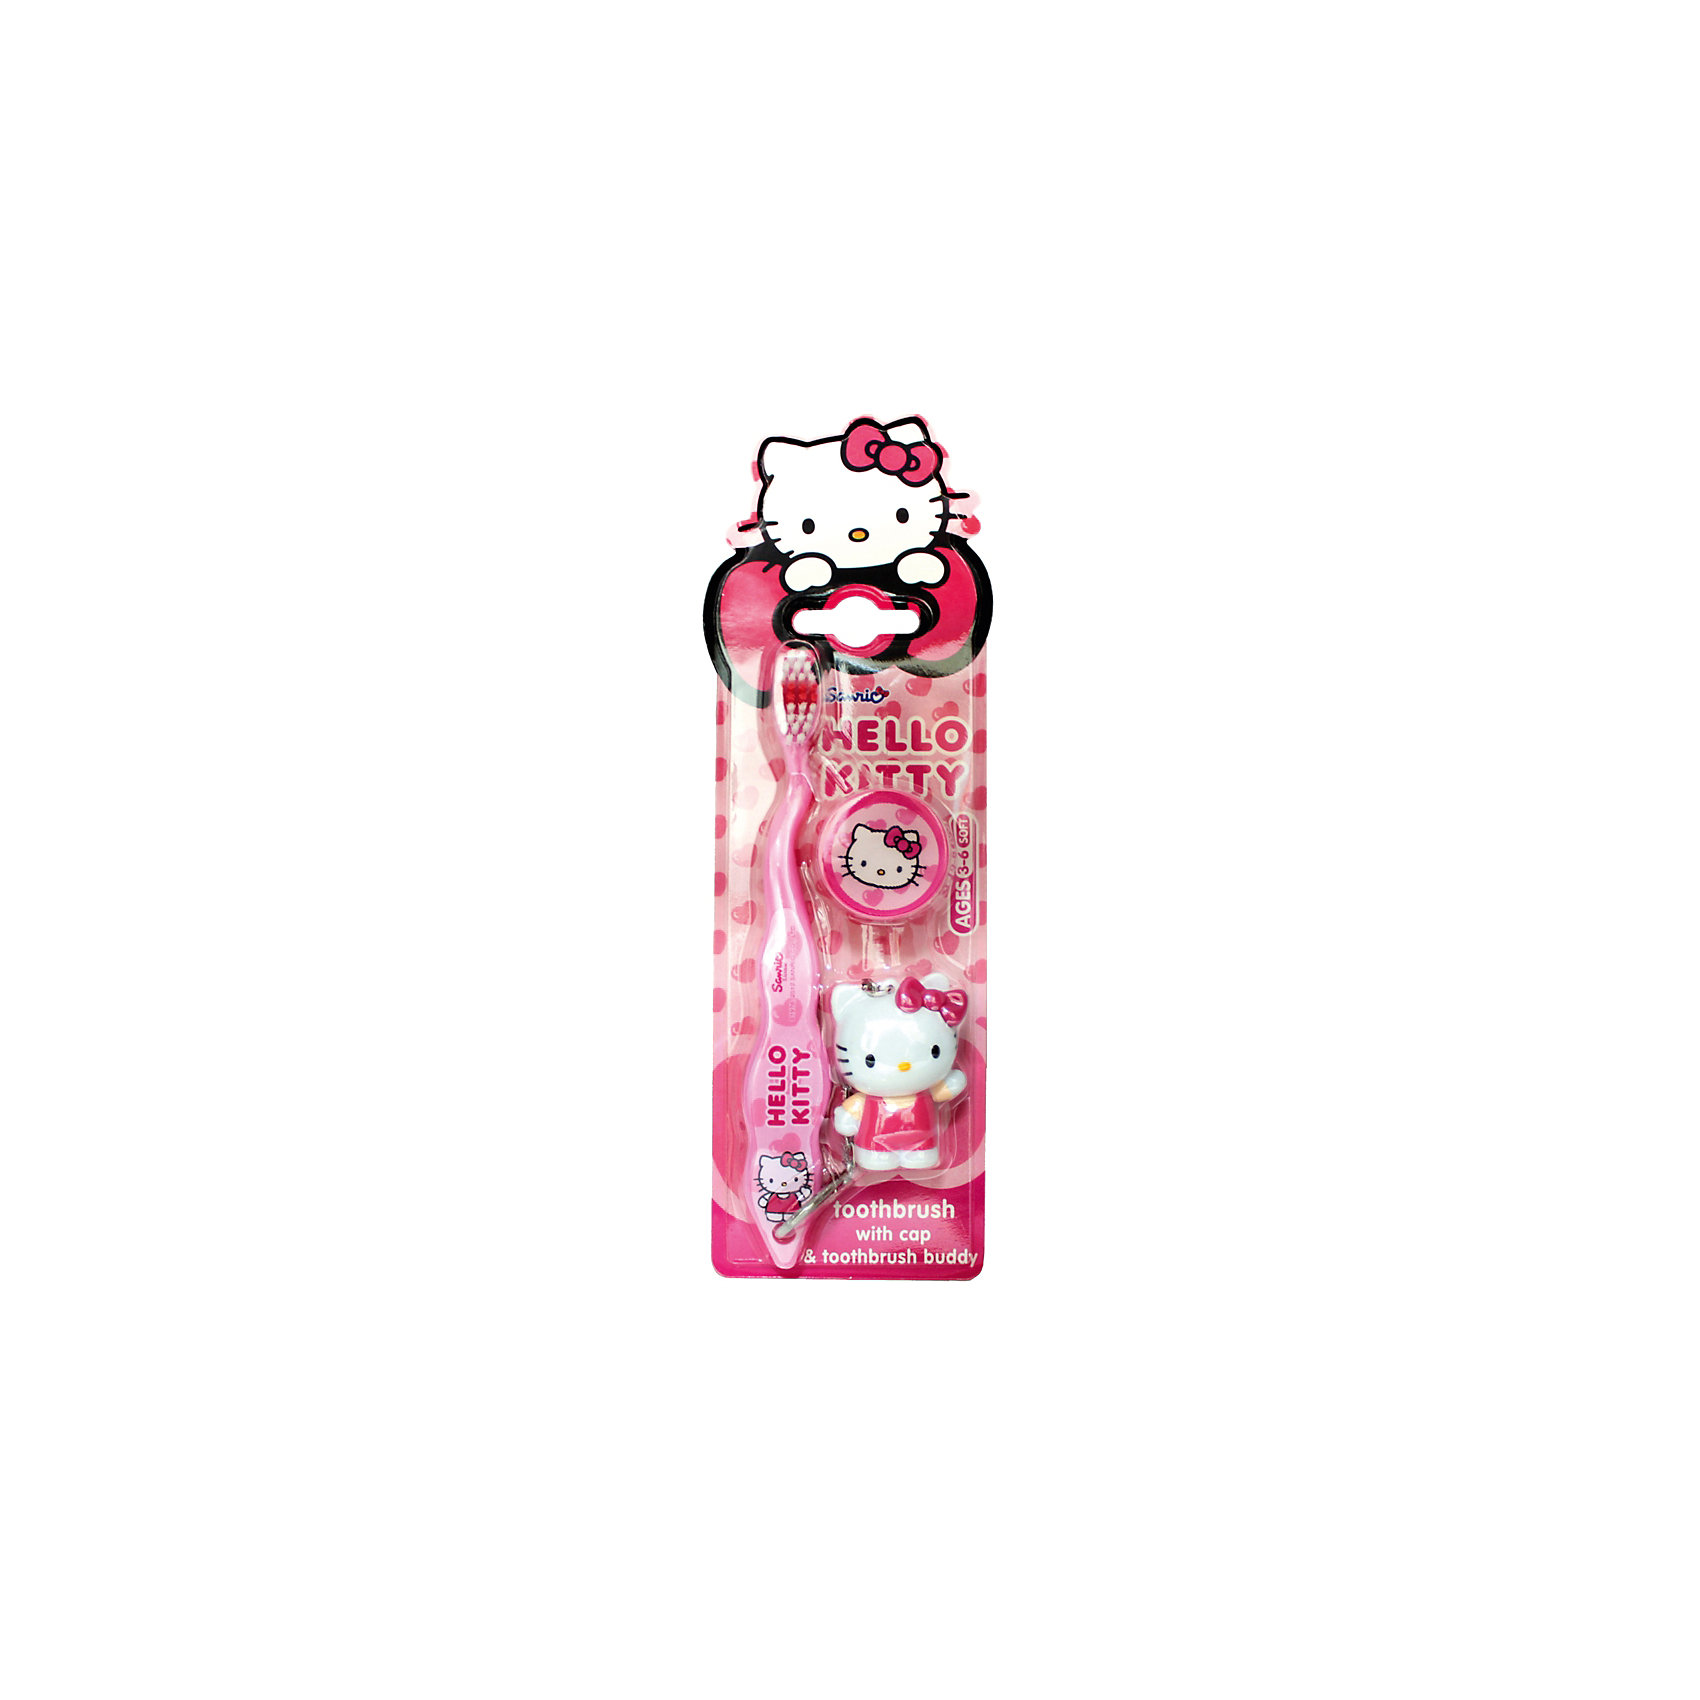 Зубная щетка Hello Kitty 3D, дорожная с брелоком, Firefly